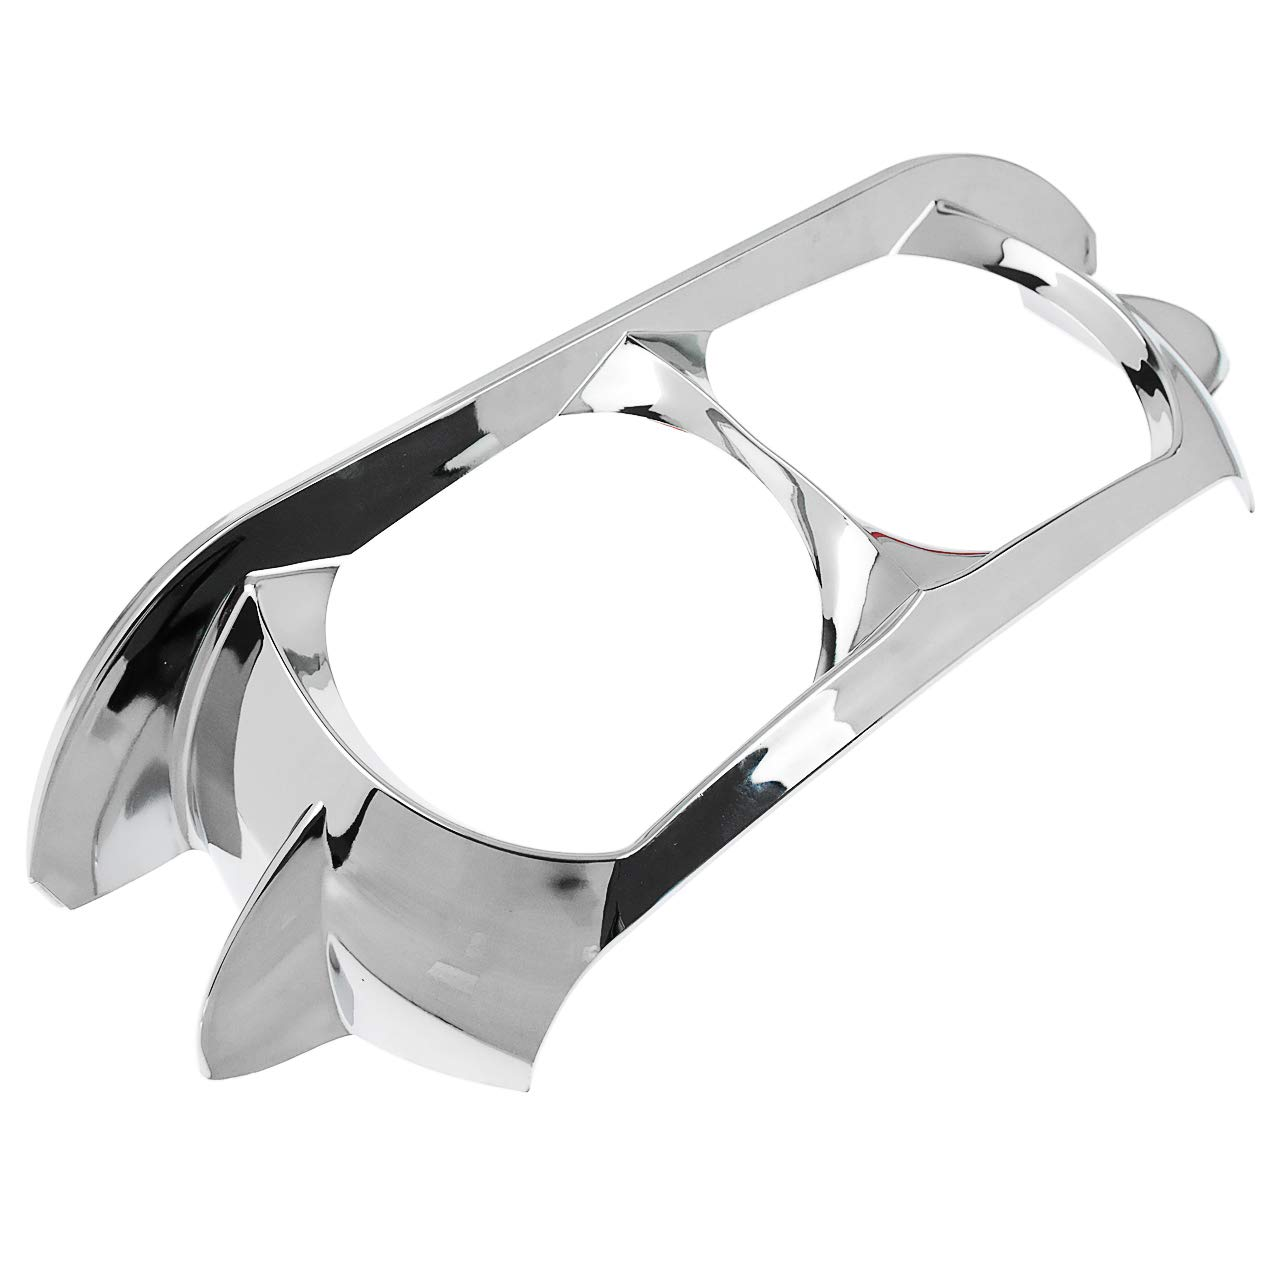 Rebacker Motorcycle Headlamp Headlight Trim Cover Bezel for Harley Road Glide 2015-2019,Vivid Black